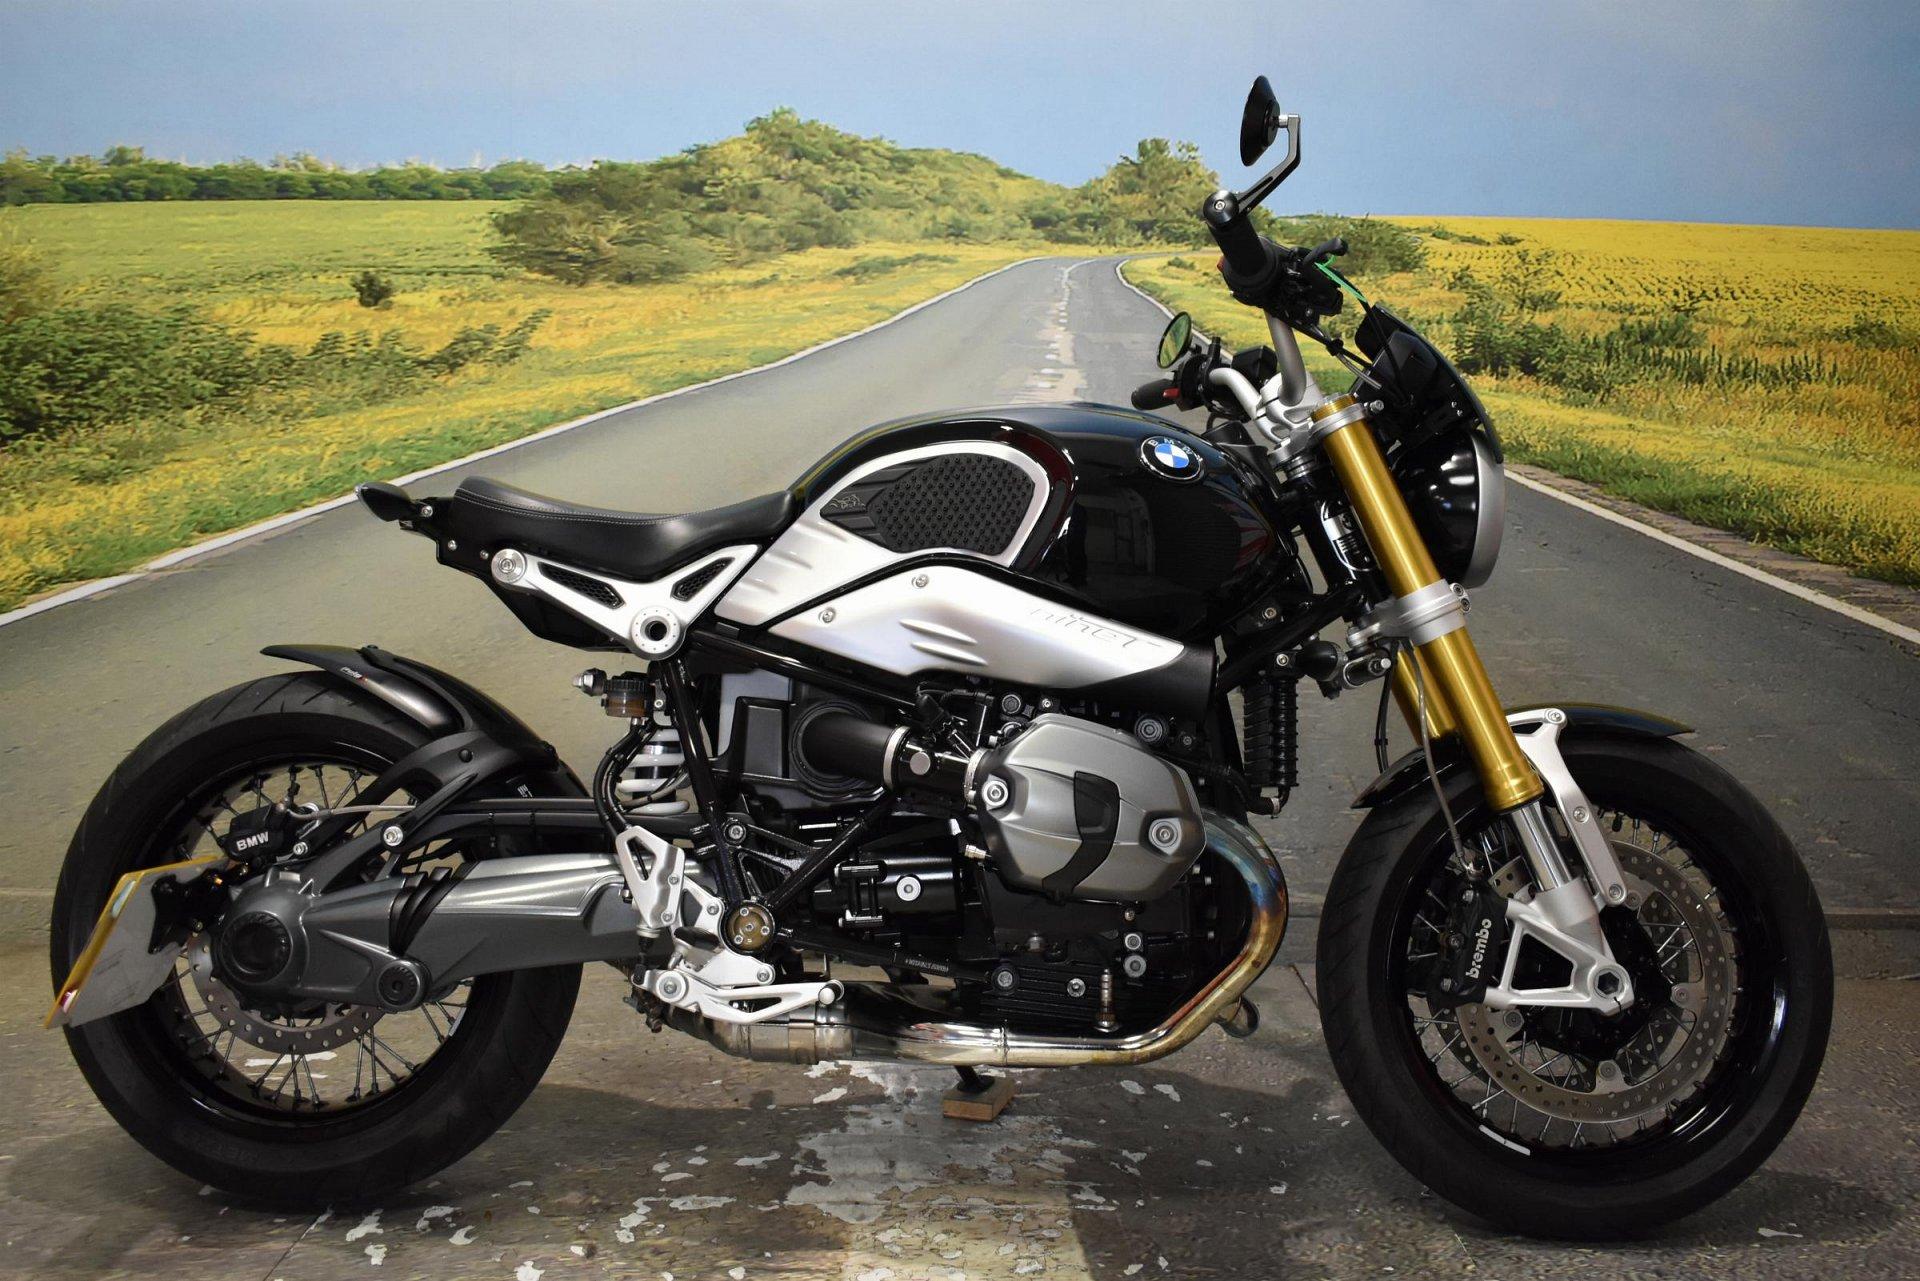 2015 BMW R Ninet for sale in Derbyshire